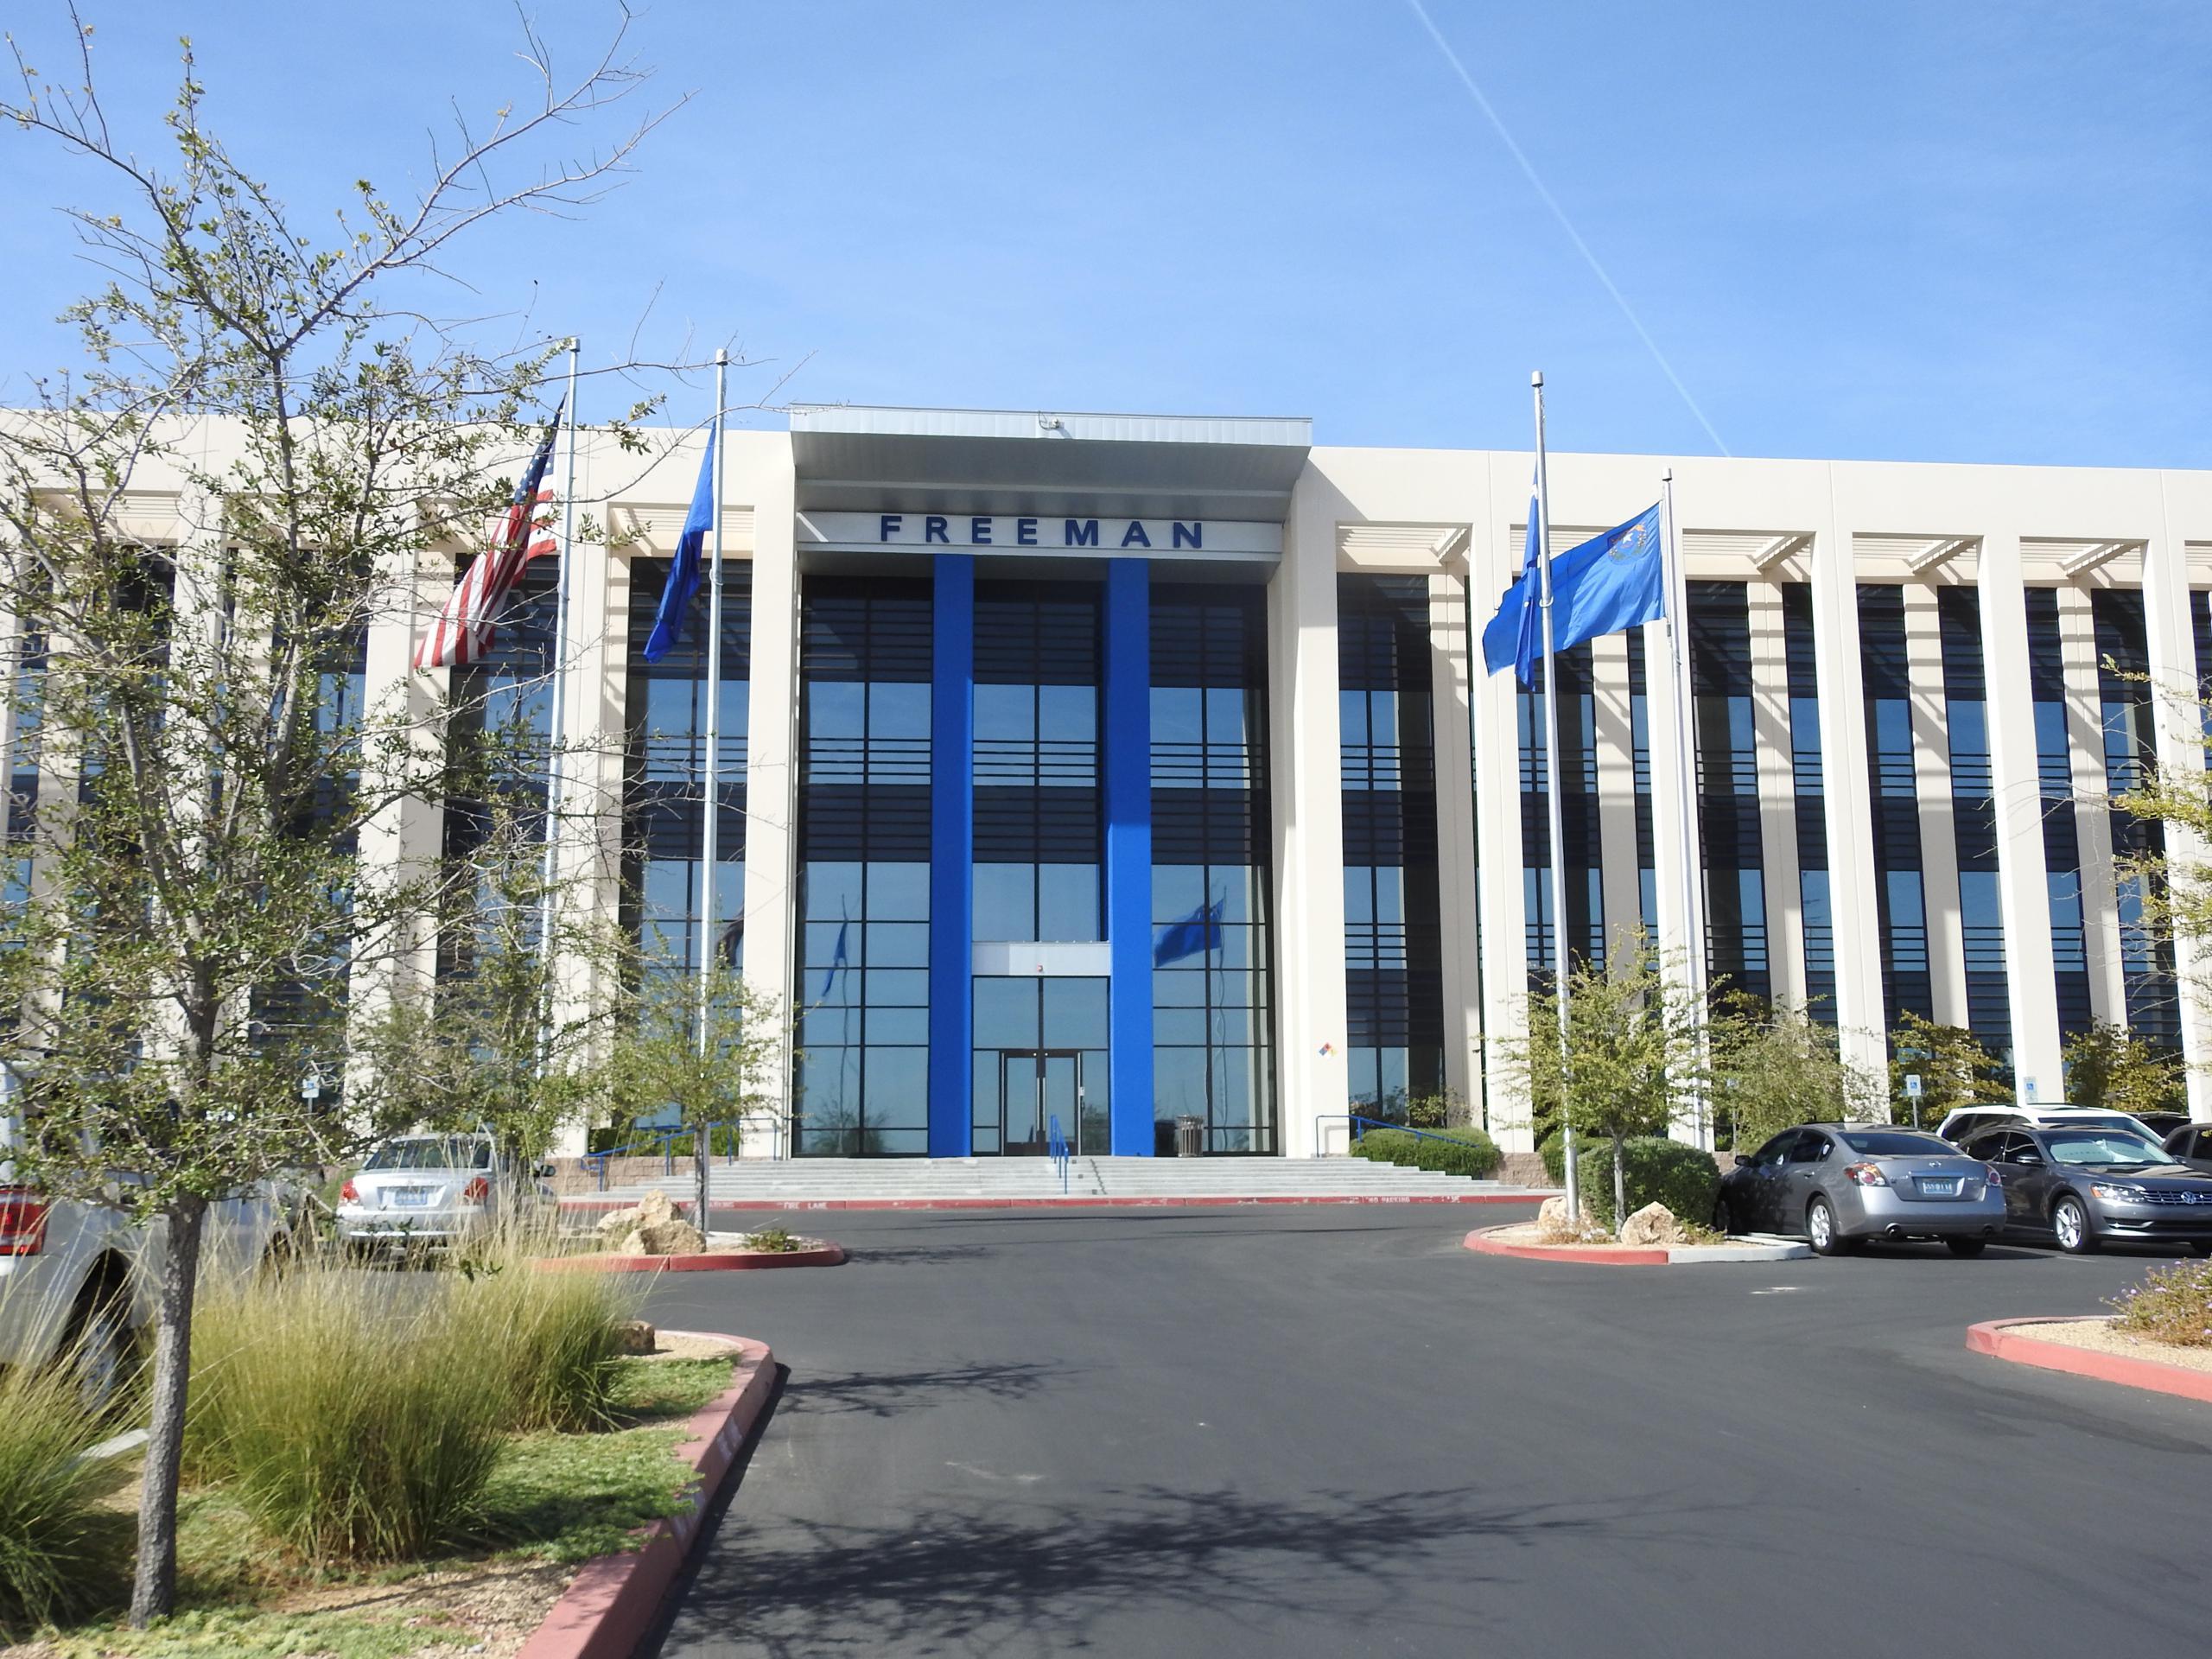 Freeman office in Las Vegas, Nevada.